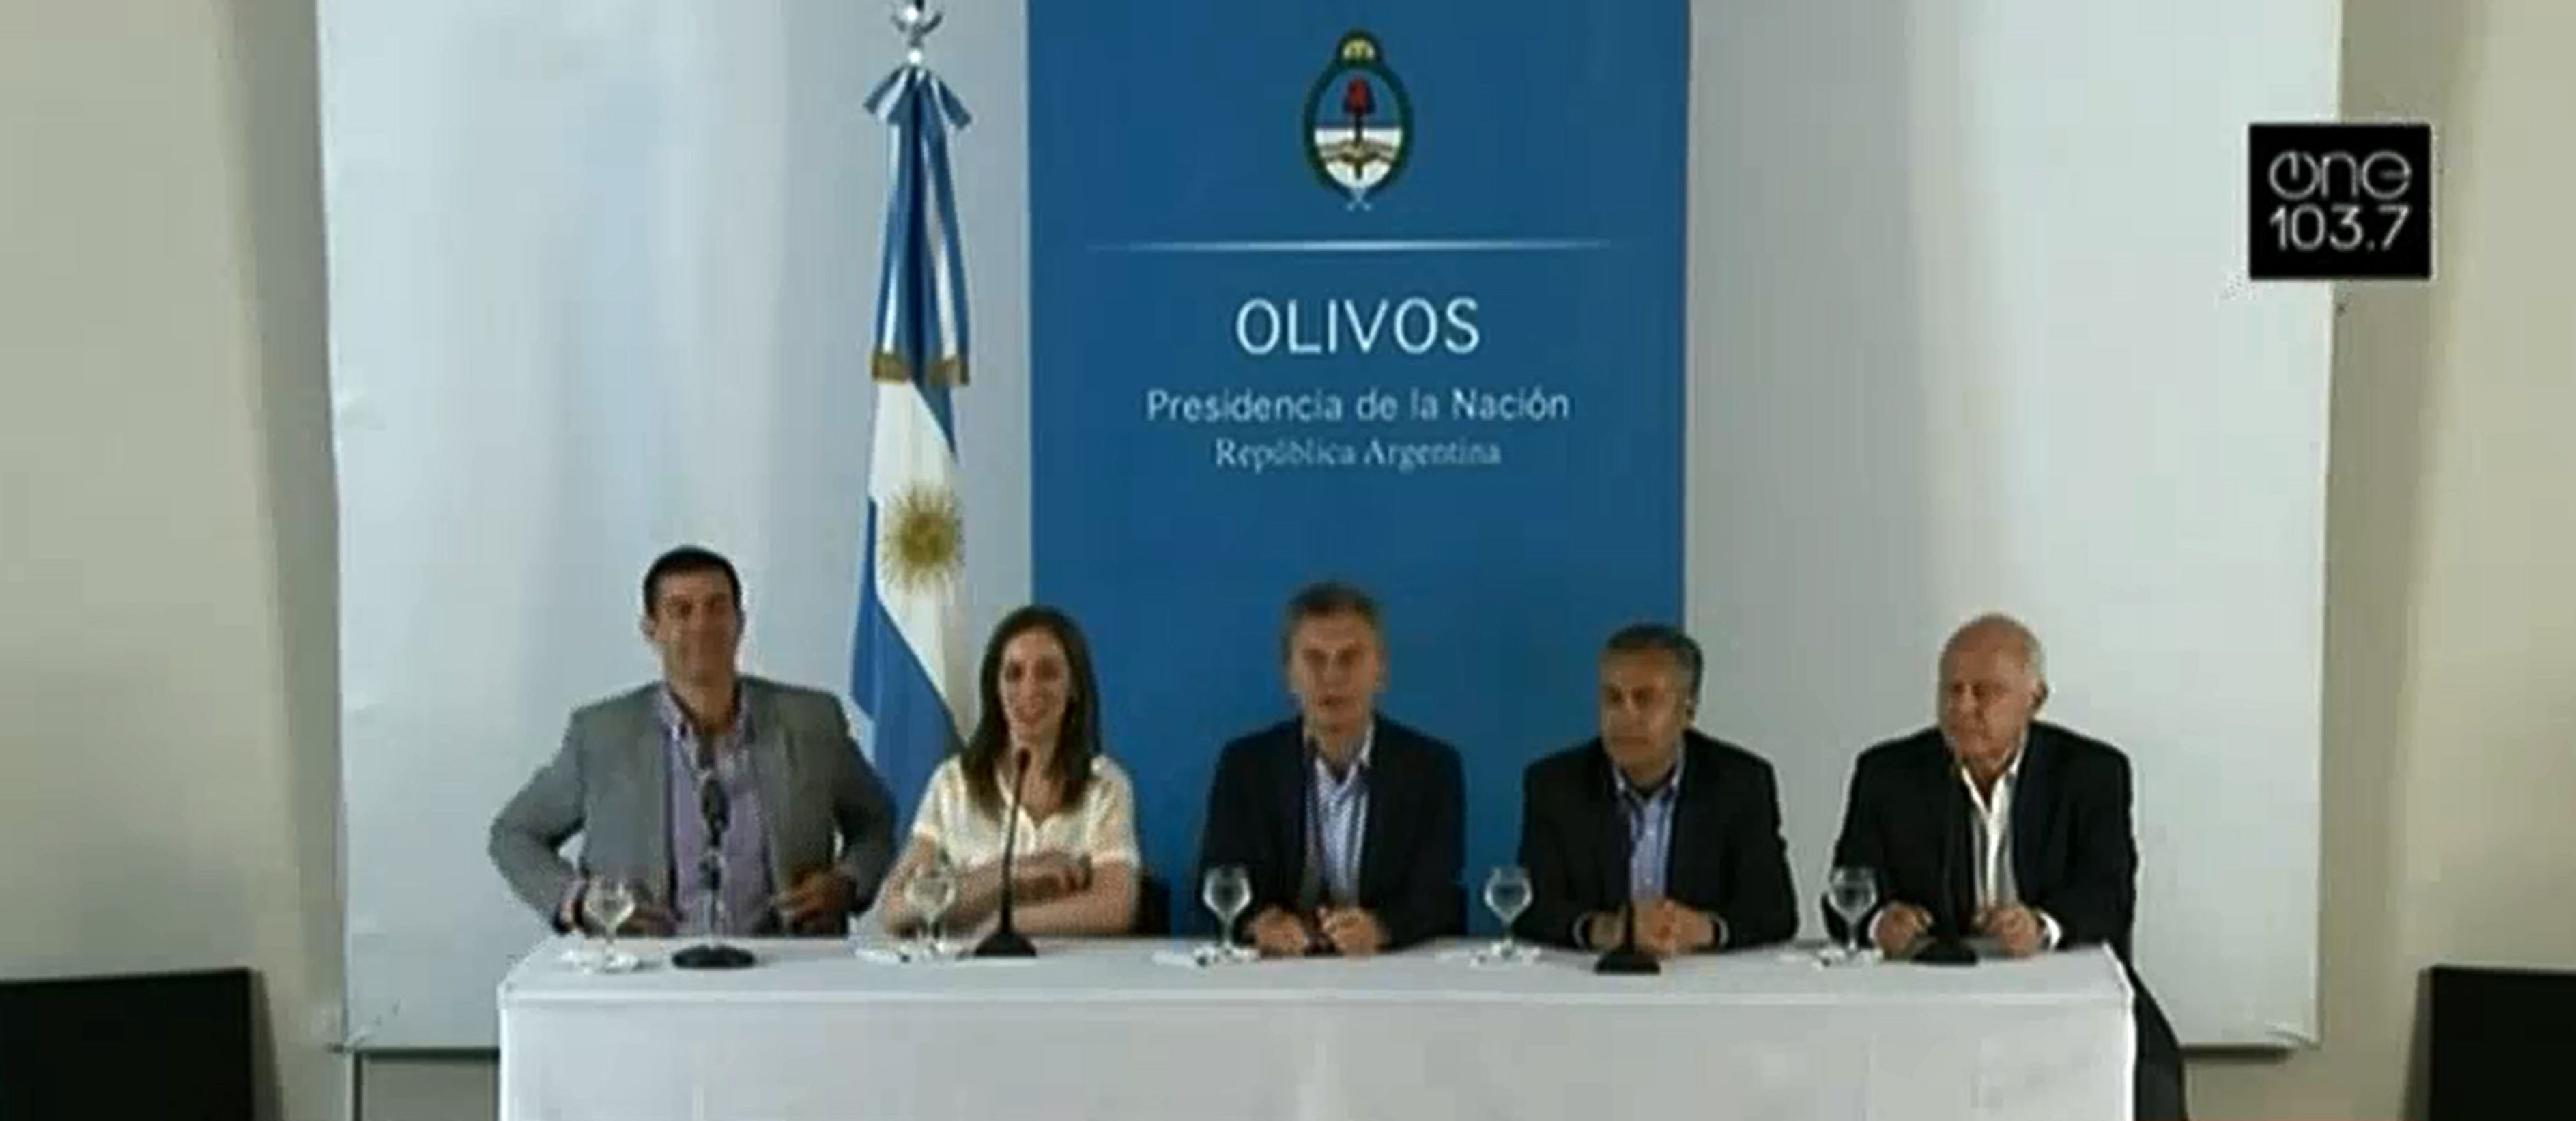 Reunión de Macri con los gobernadores: Tenemos que ser un equipo